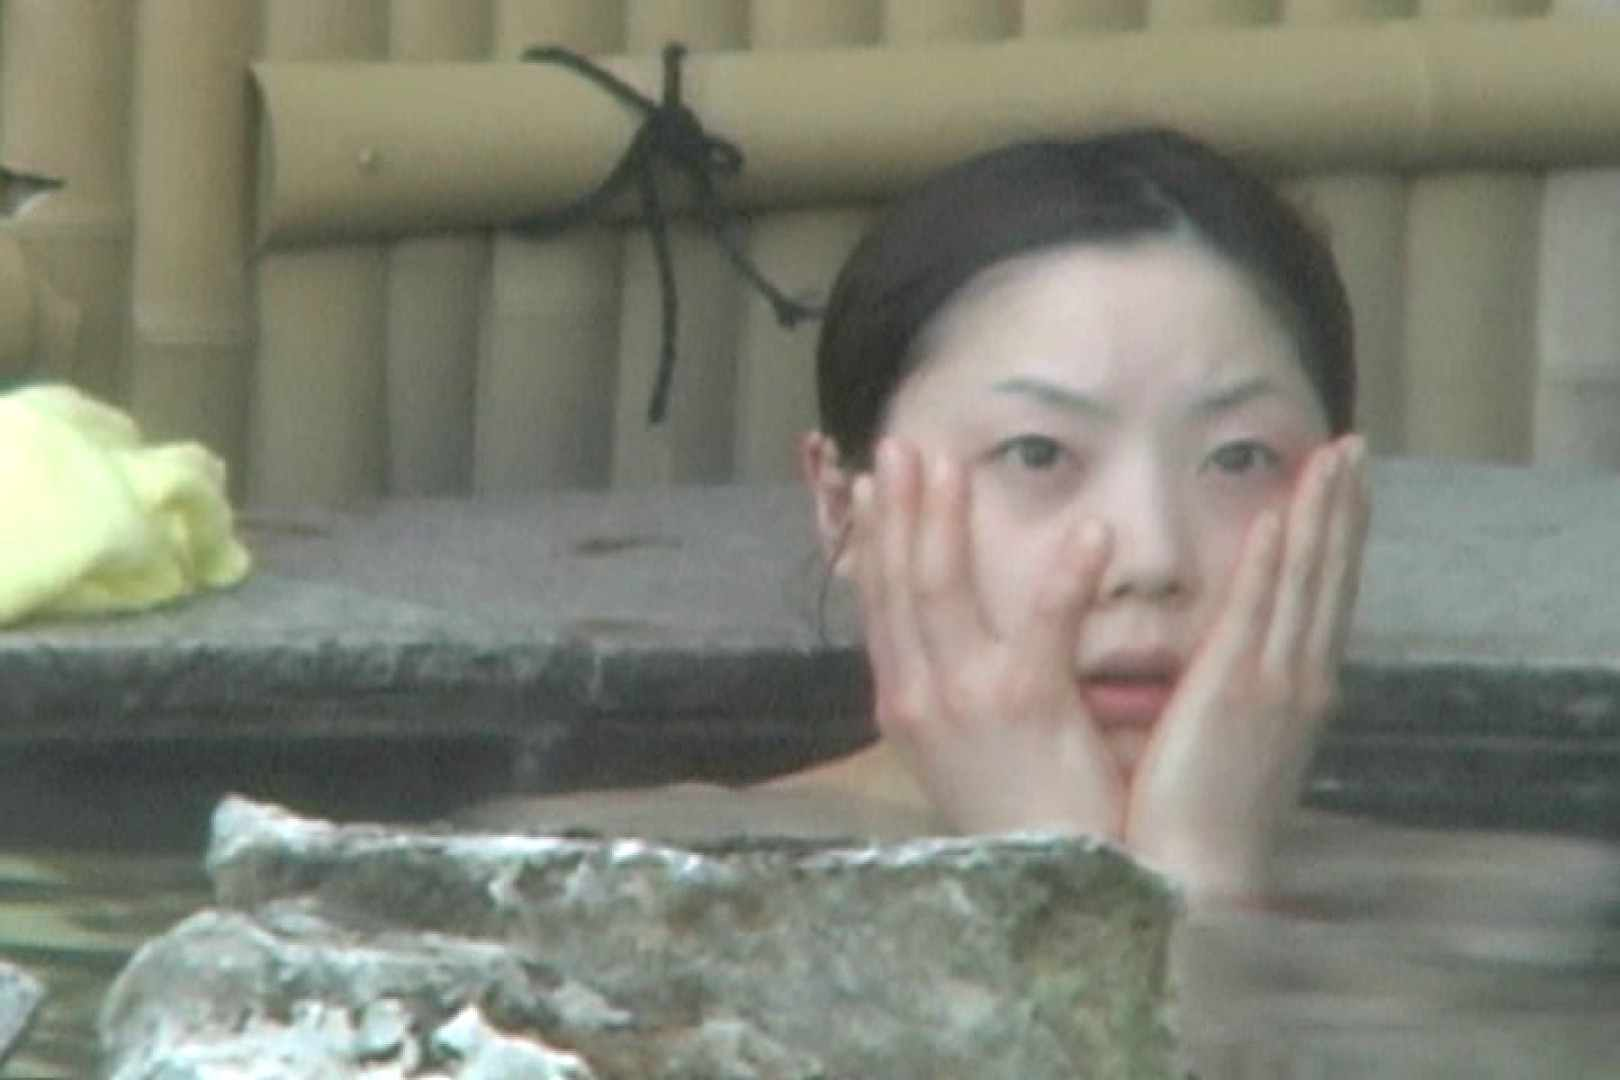 Aquaな露天風呂Vol.596 OLセックス | 盗撮  77画像 4